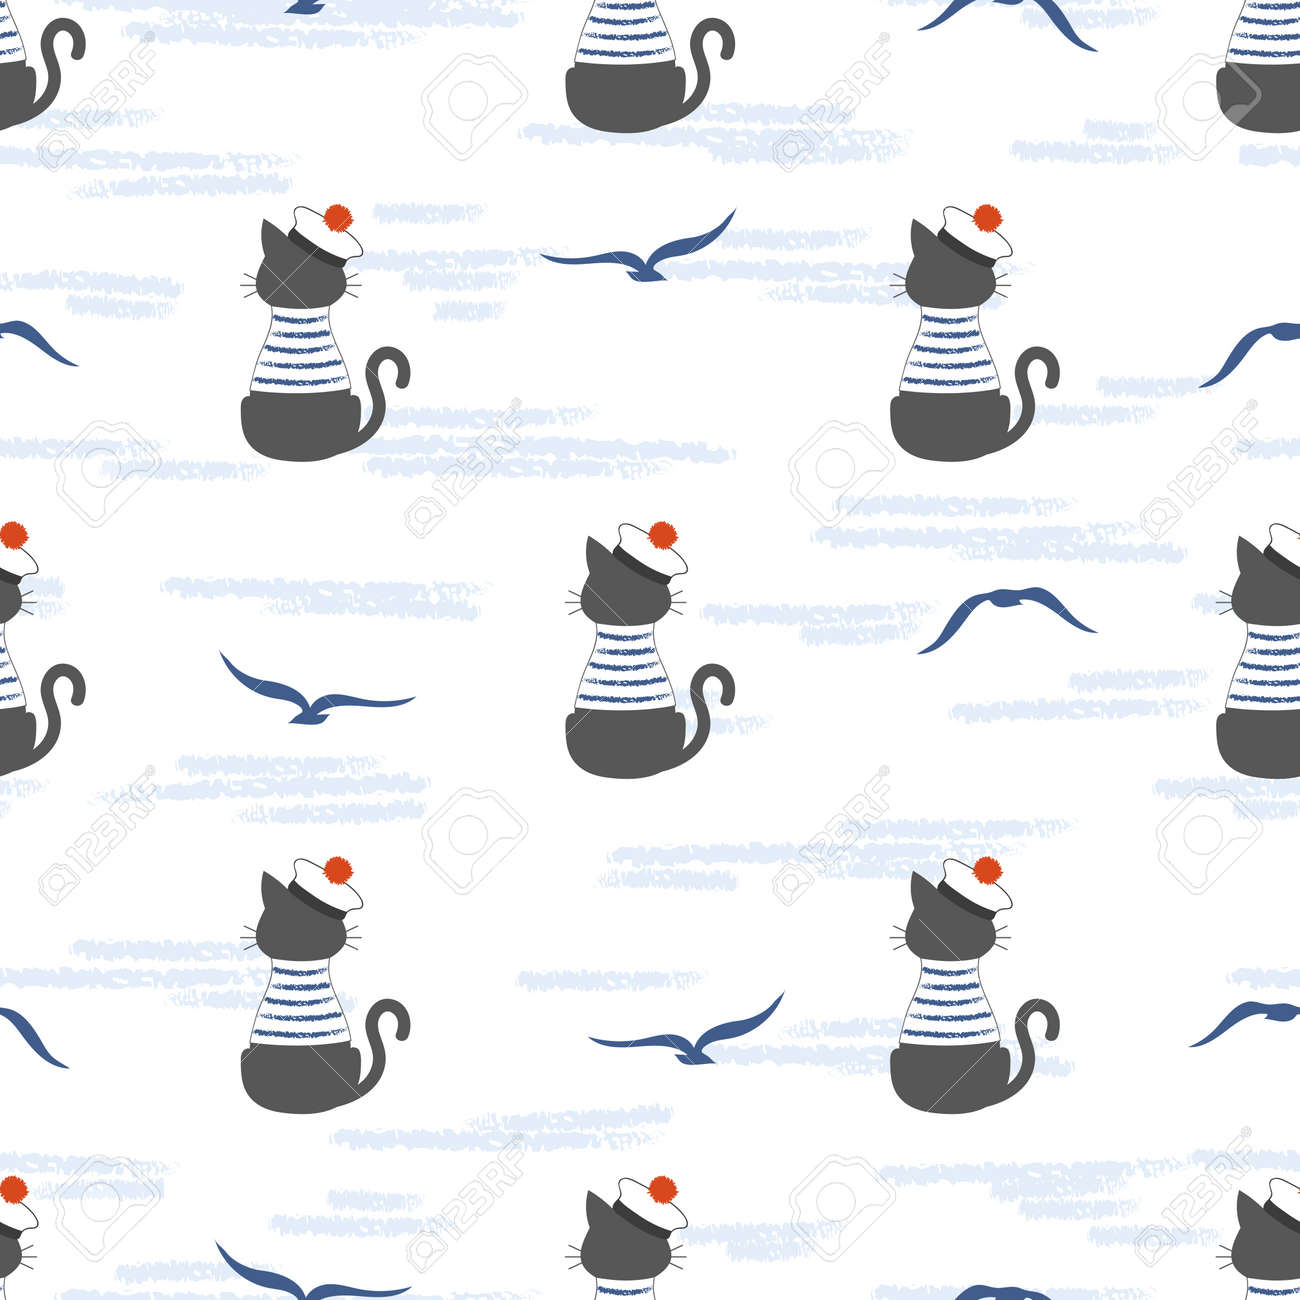 Seamless Marine Pattern With Cartoon Cat Sailor And Seagulls